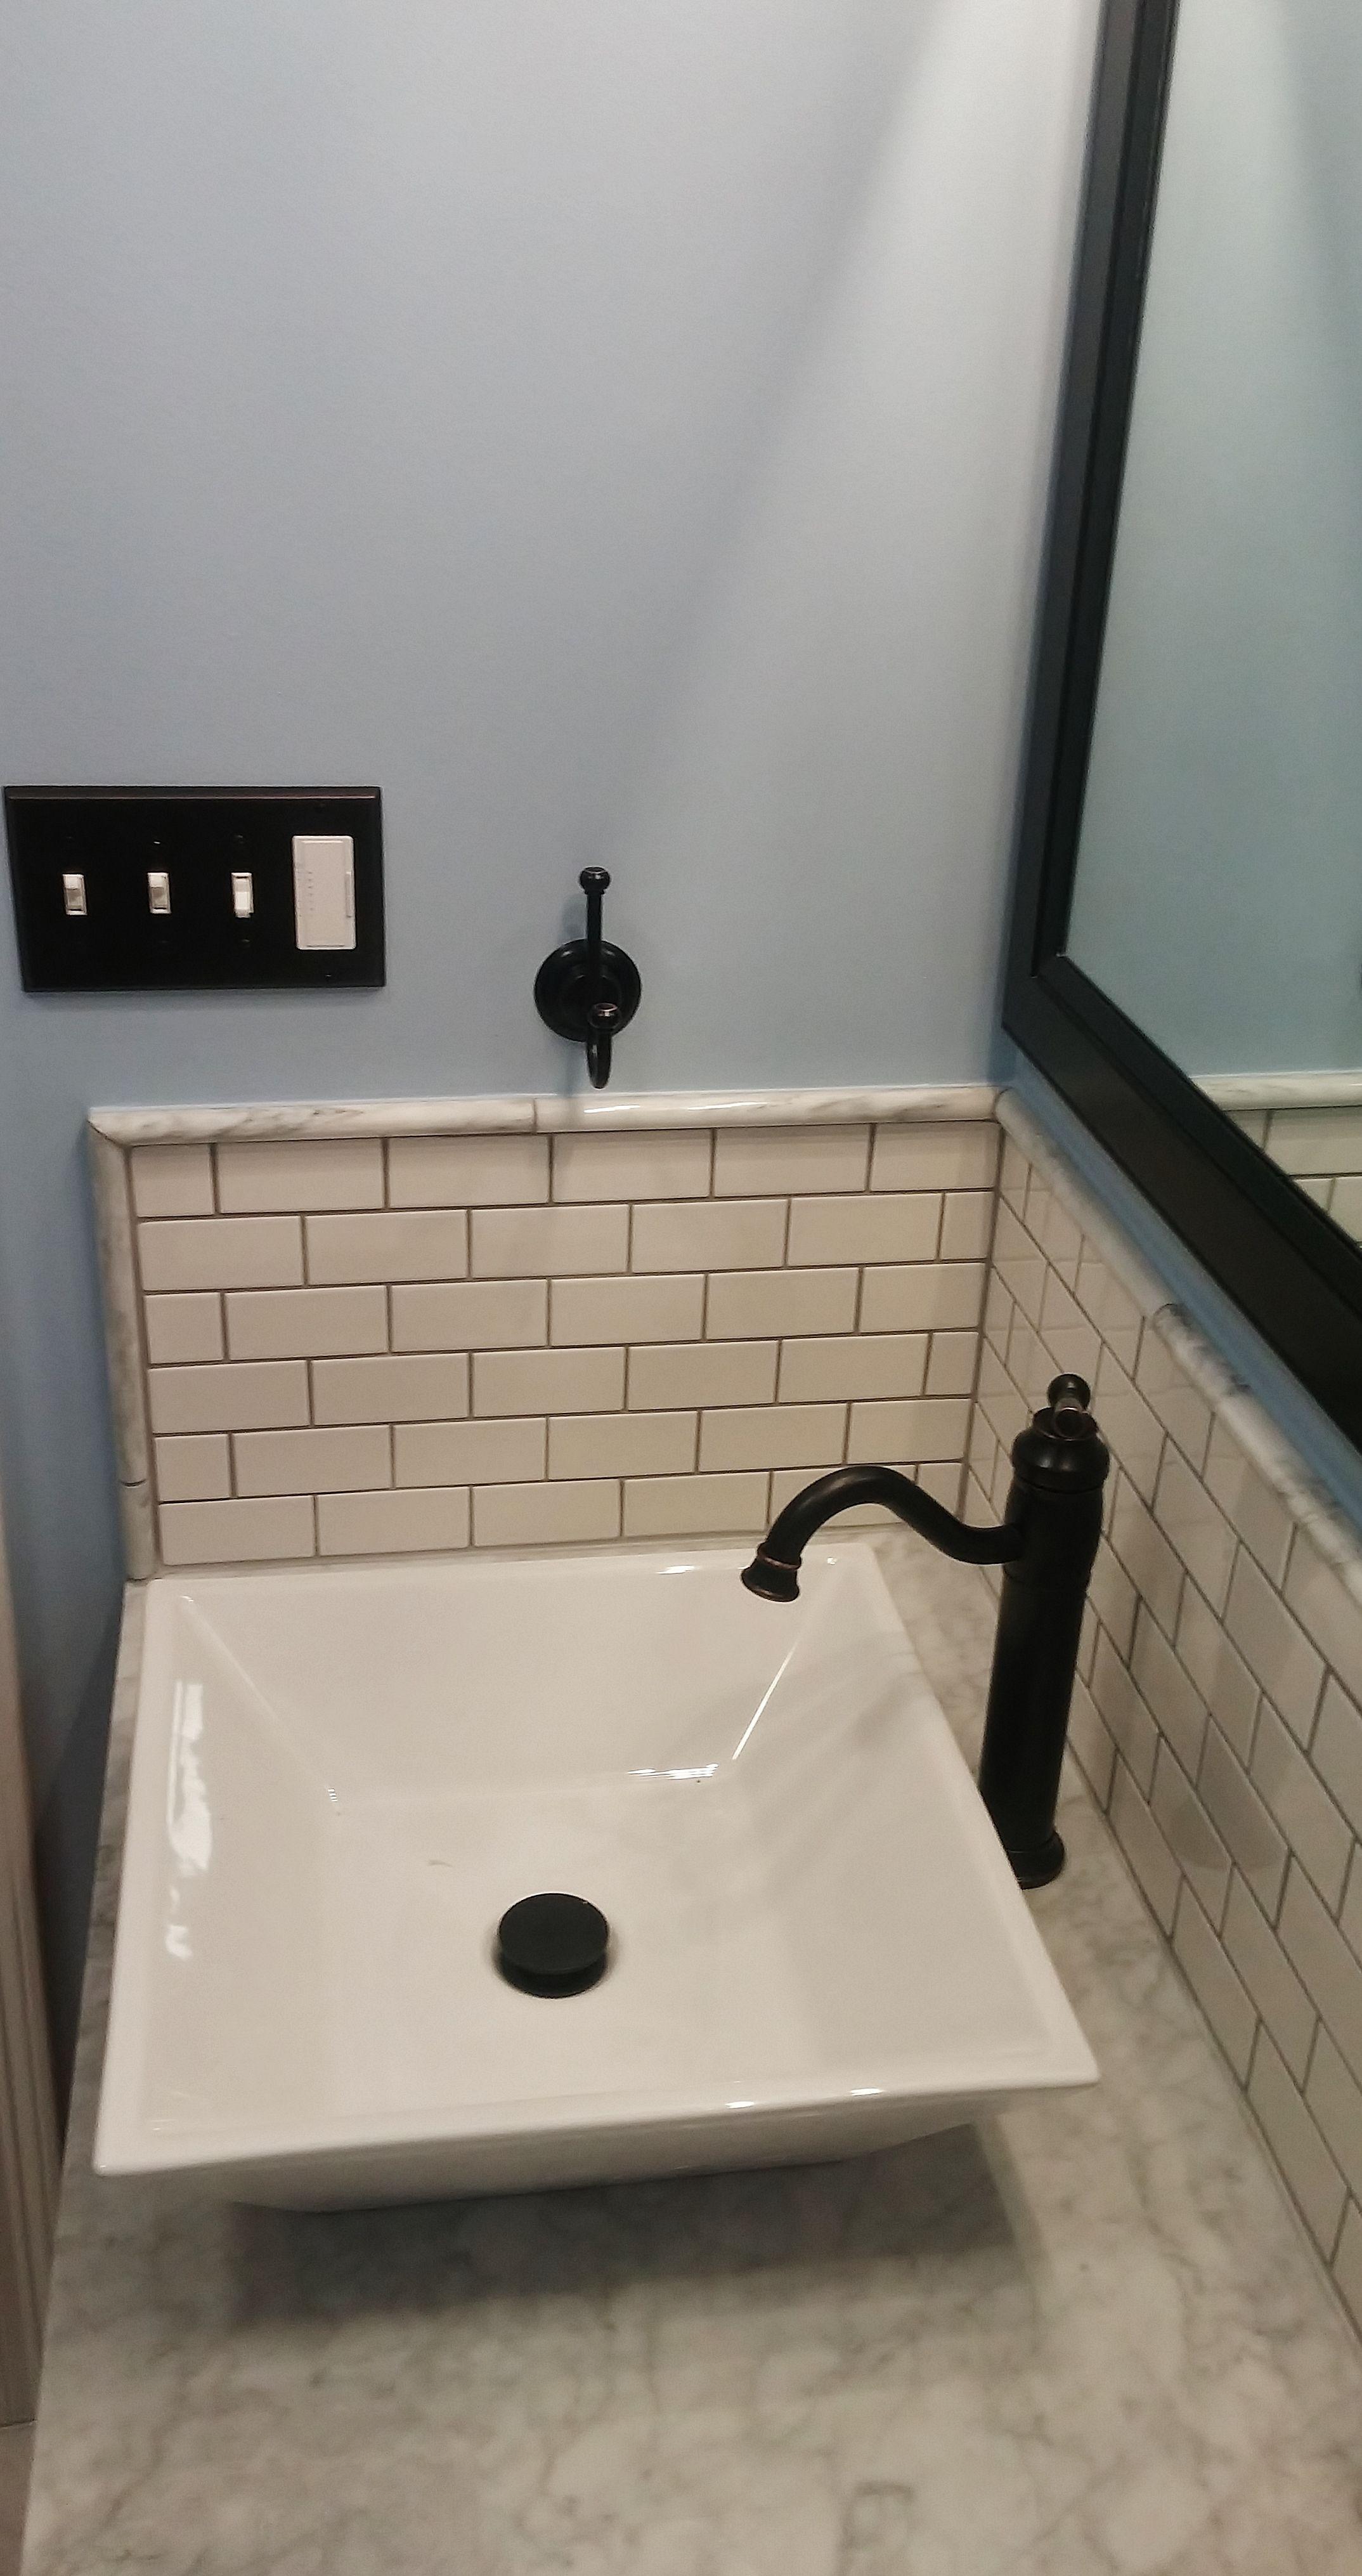 Bathroom Remodel Renovation Countermount Faucet Oilrubbed Subwaytile White